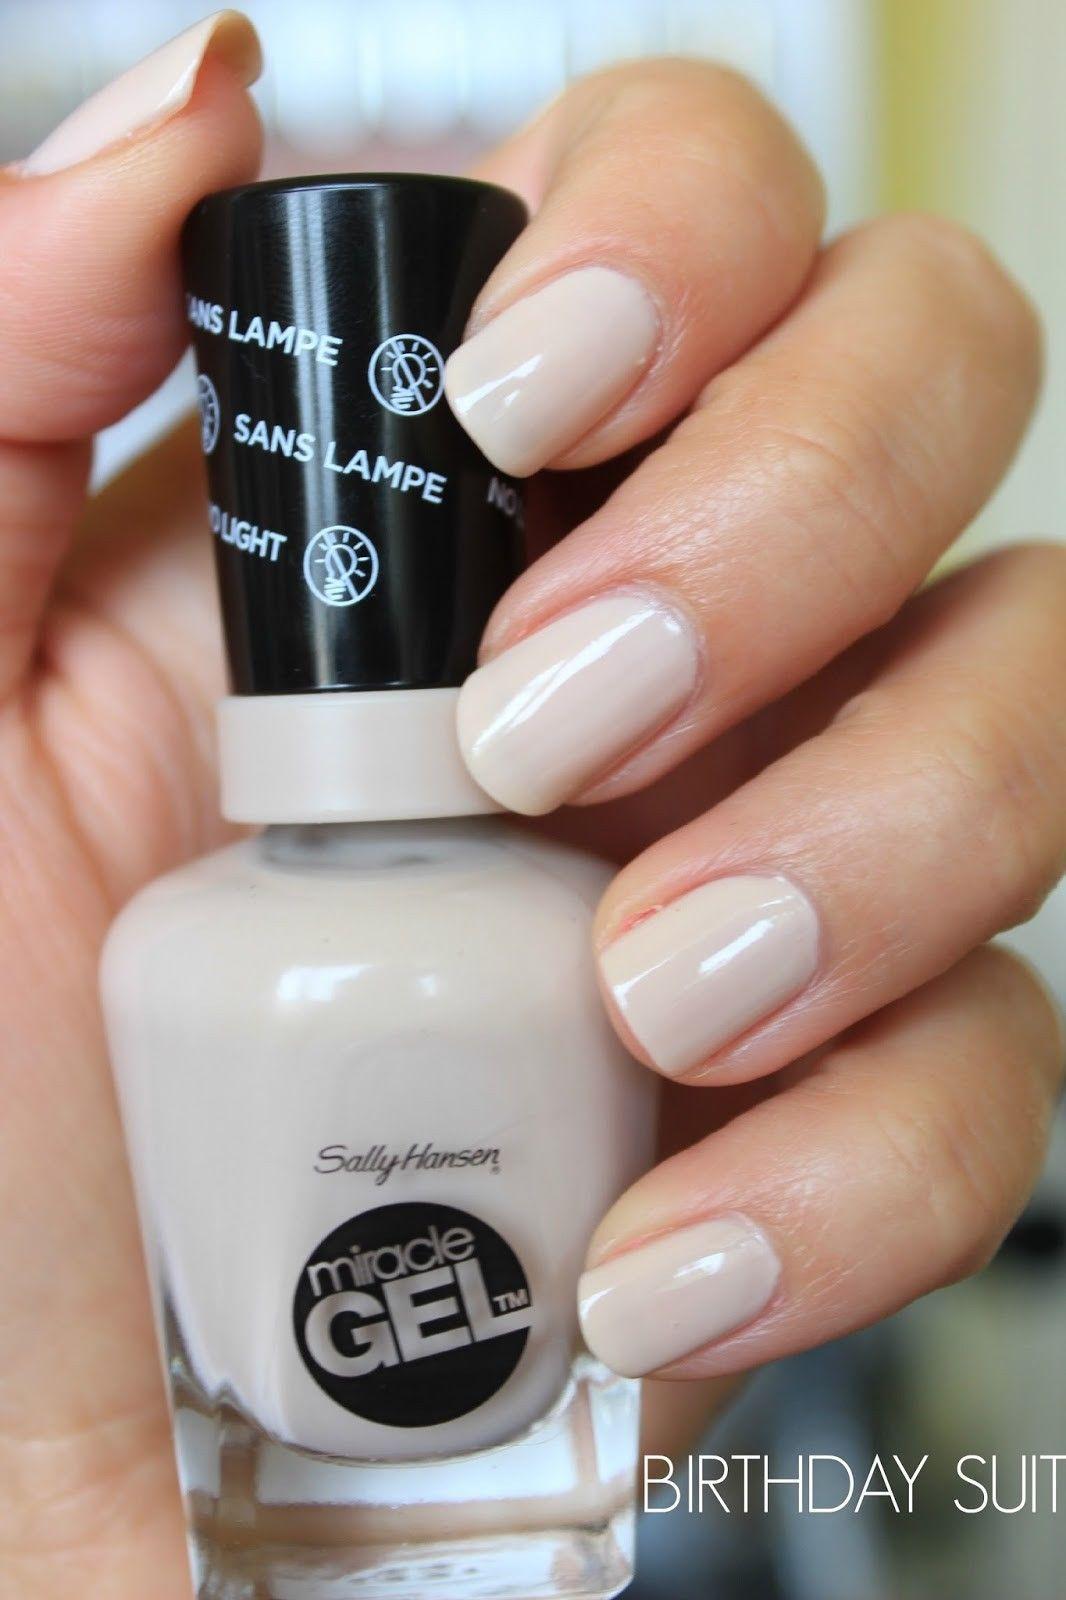 3 29 Sally Hansen Miracle Gel 5 Fl Oz Birthday Suit 219 Ebay Fashion Sally Hansen Gel Sally Hansen Gel Nails Sally Hansen Nails